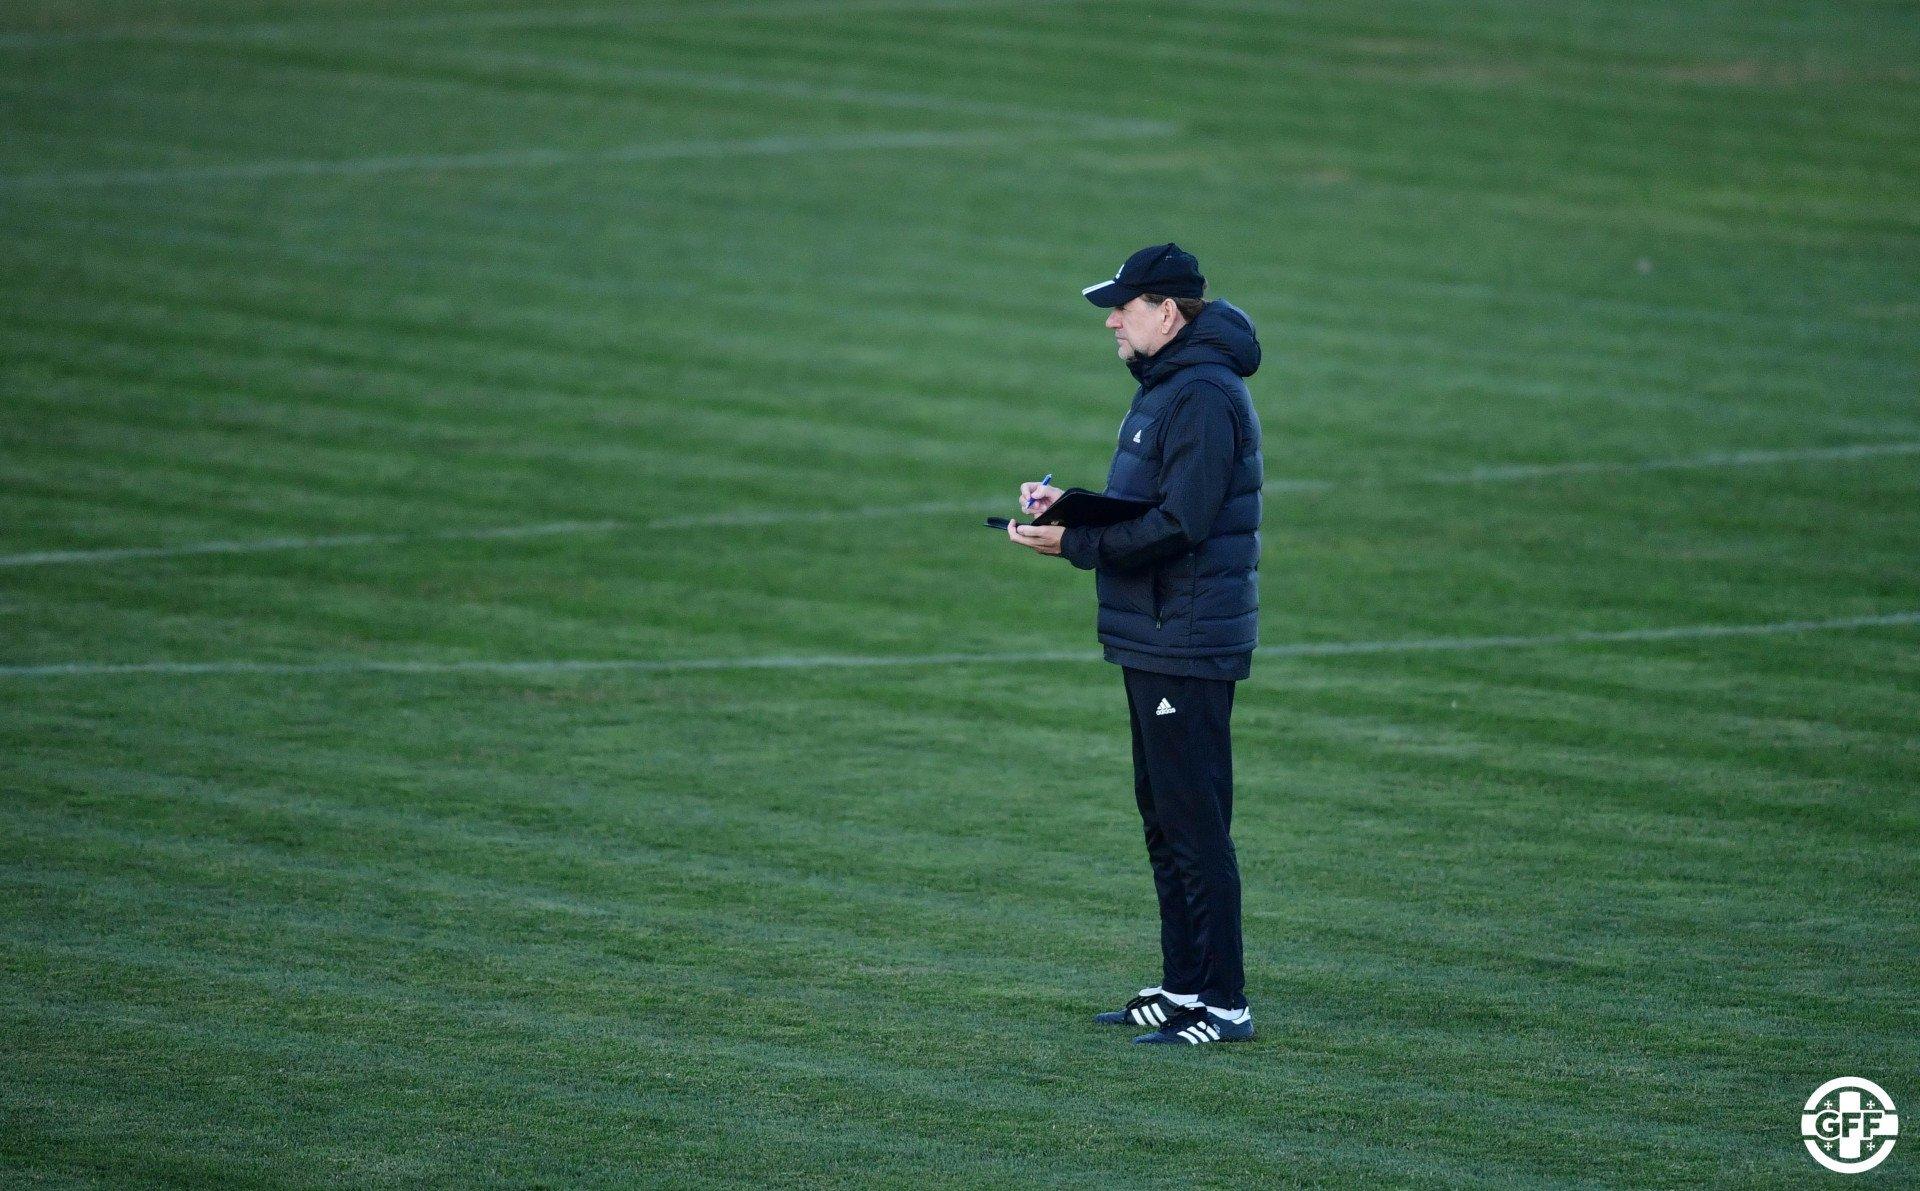 Vladimir Weiss #новости Владимир Вайсс, спорт, футбол